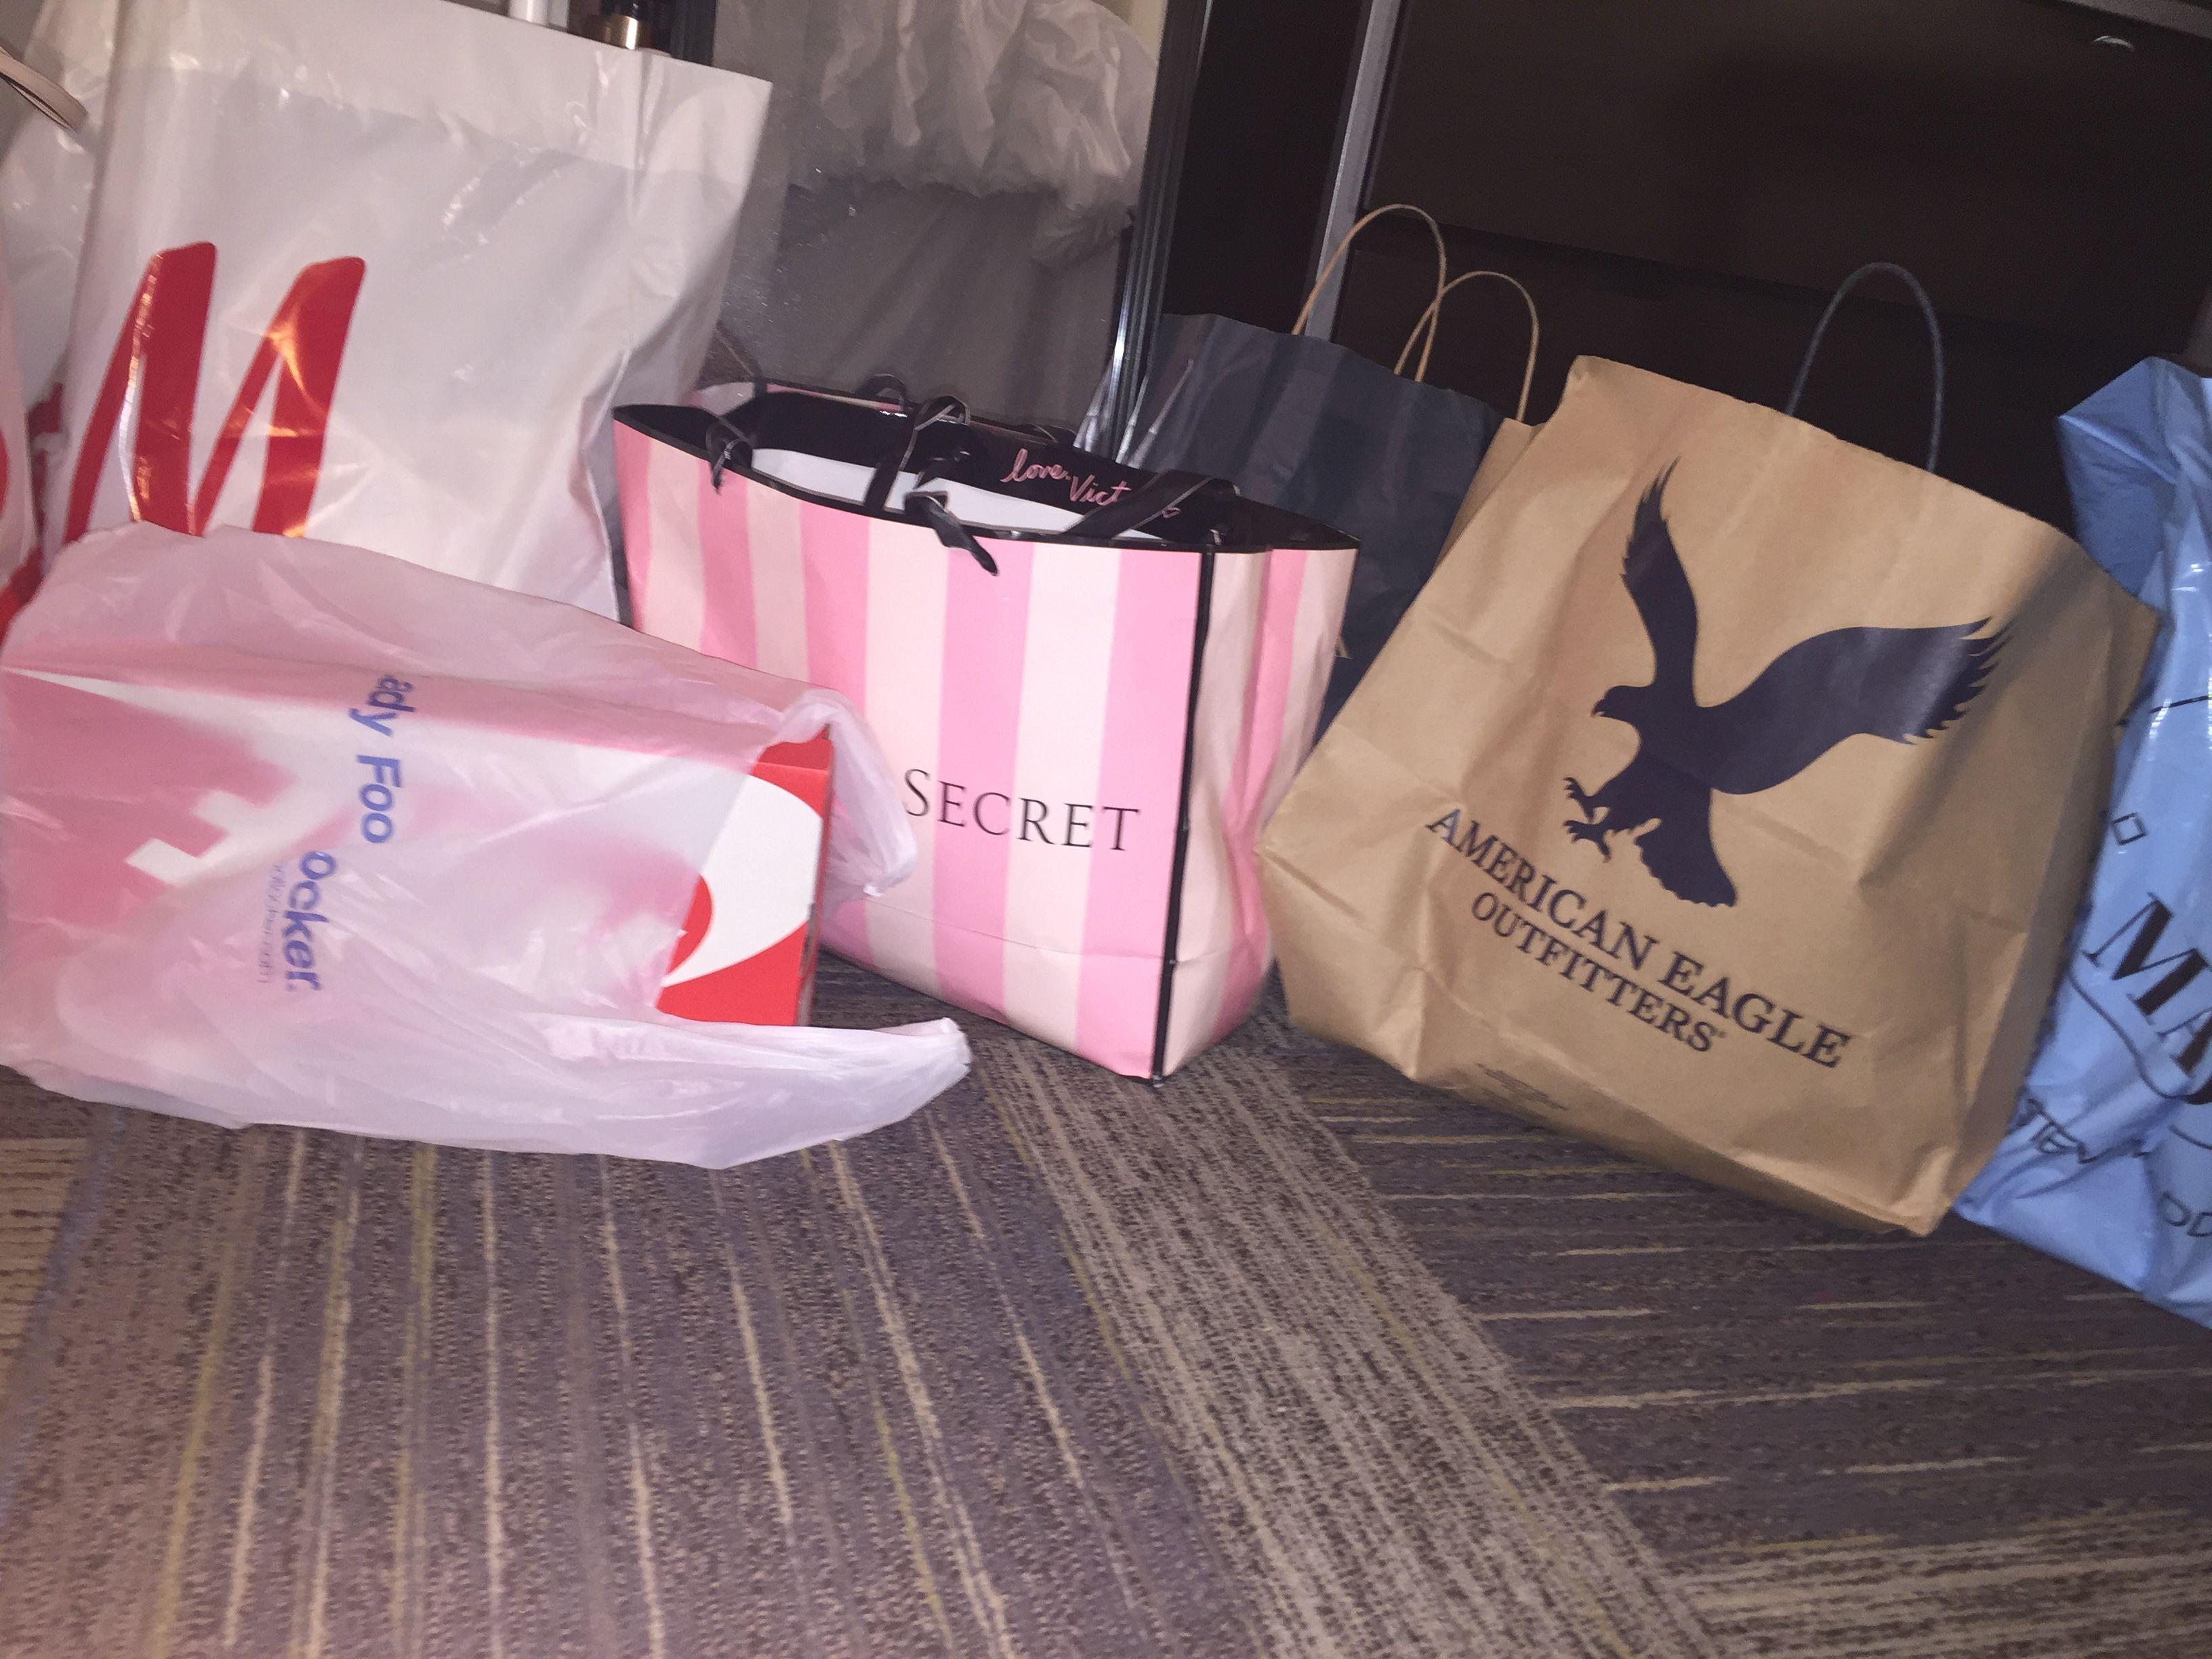 Pin By Mara S Mane On Shopping Dream Gift Birthday Goals Girly Things